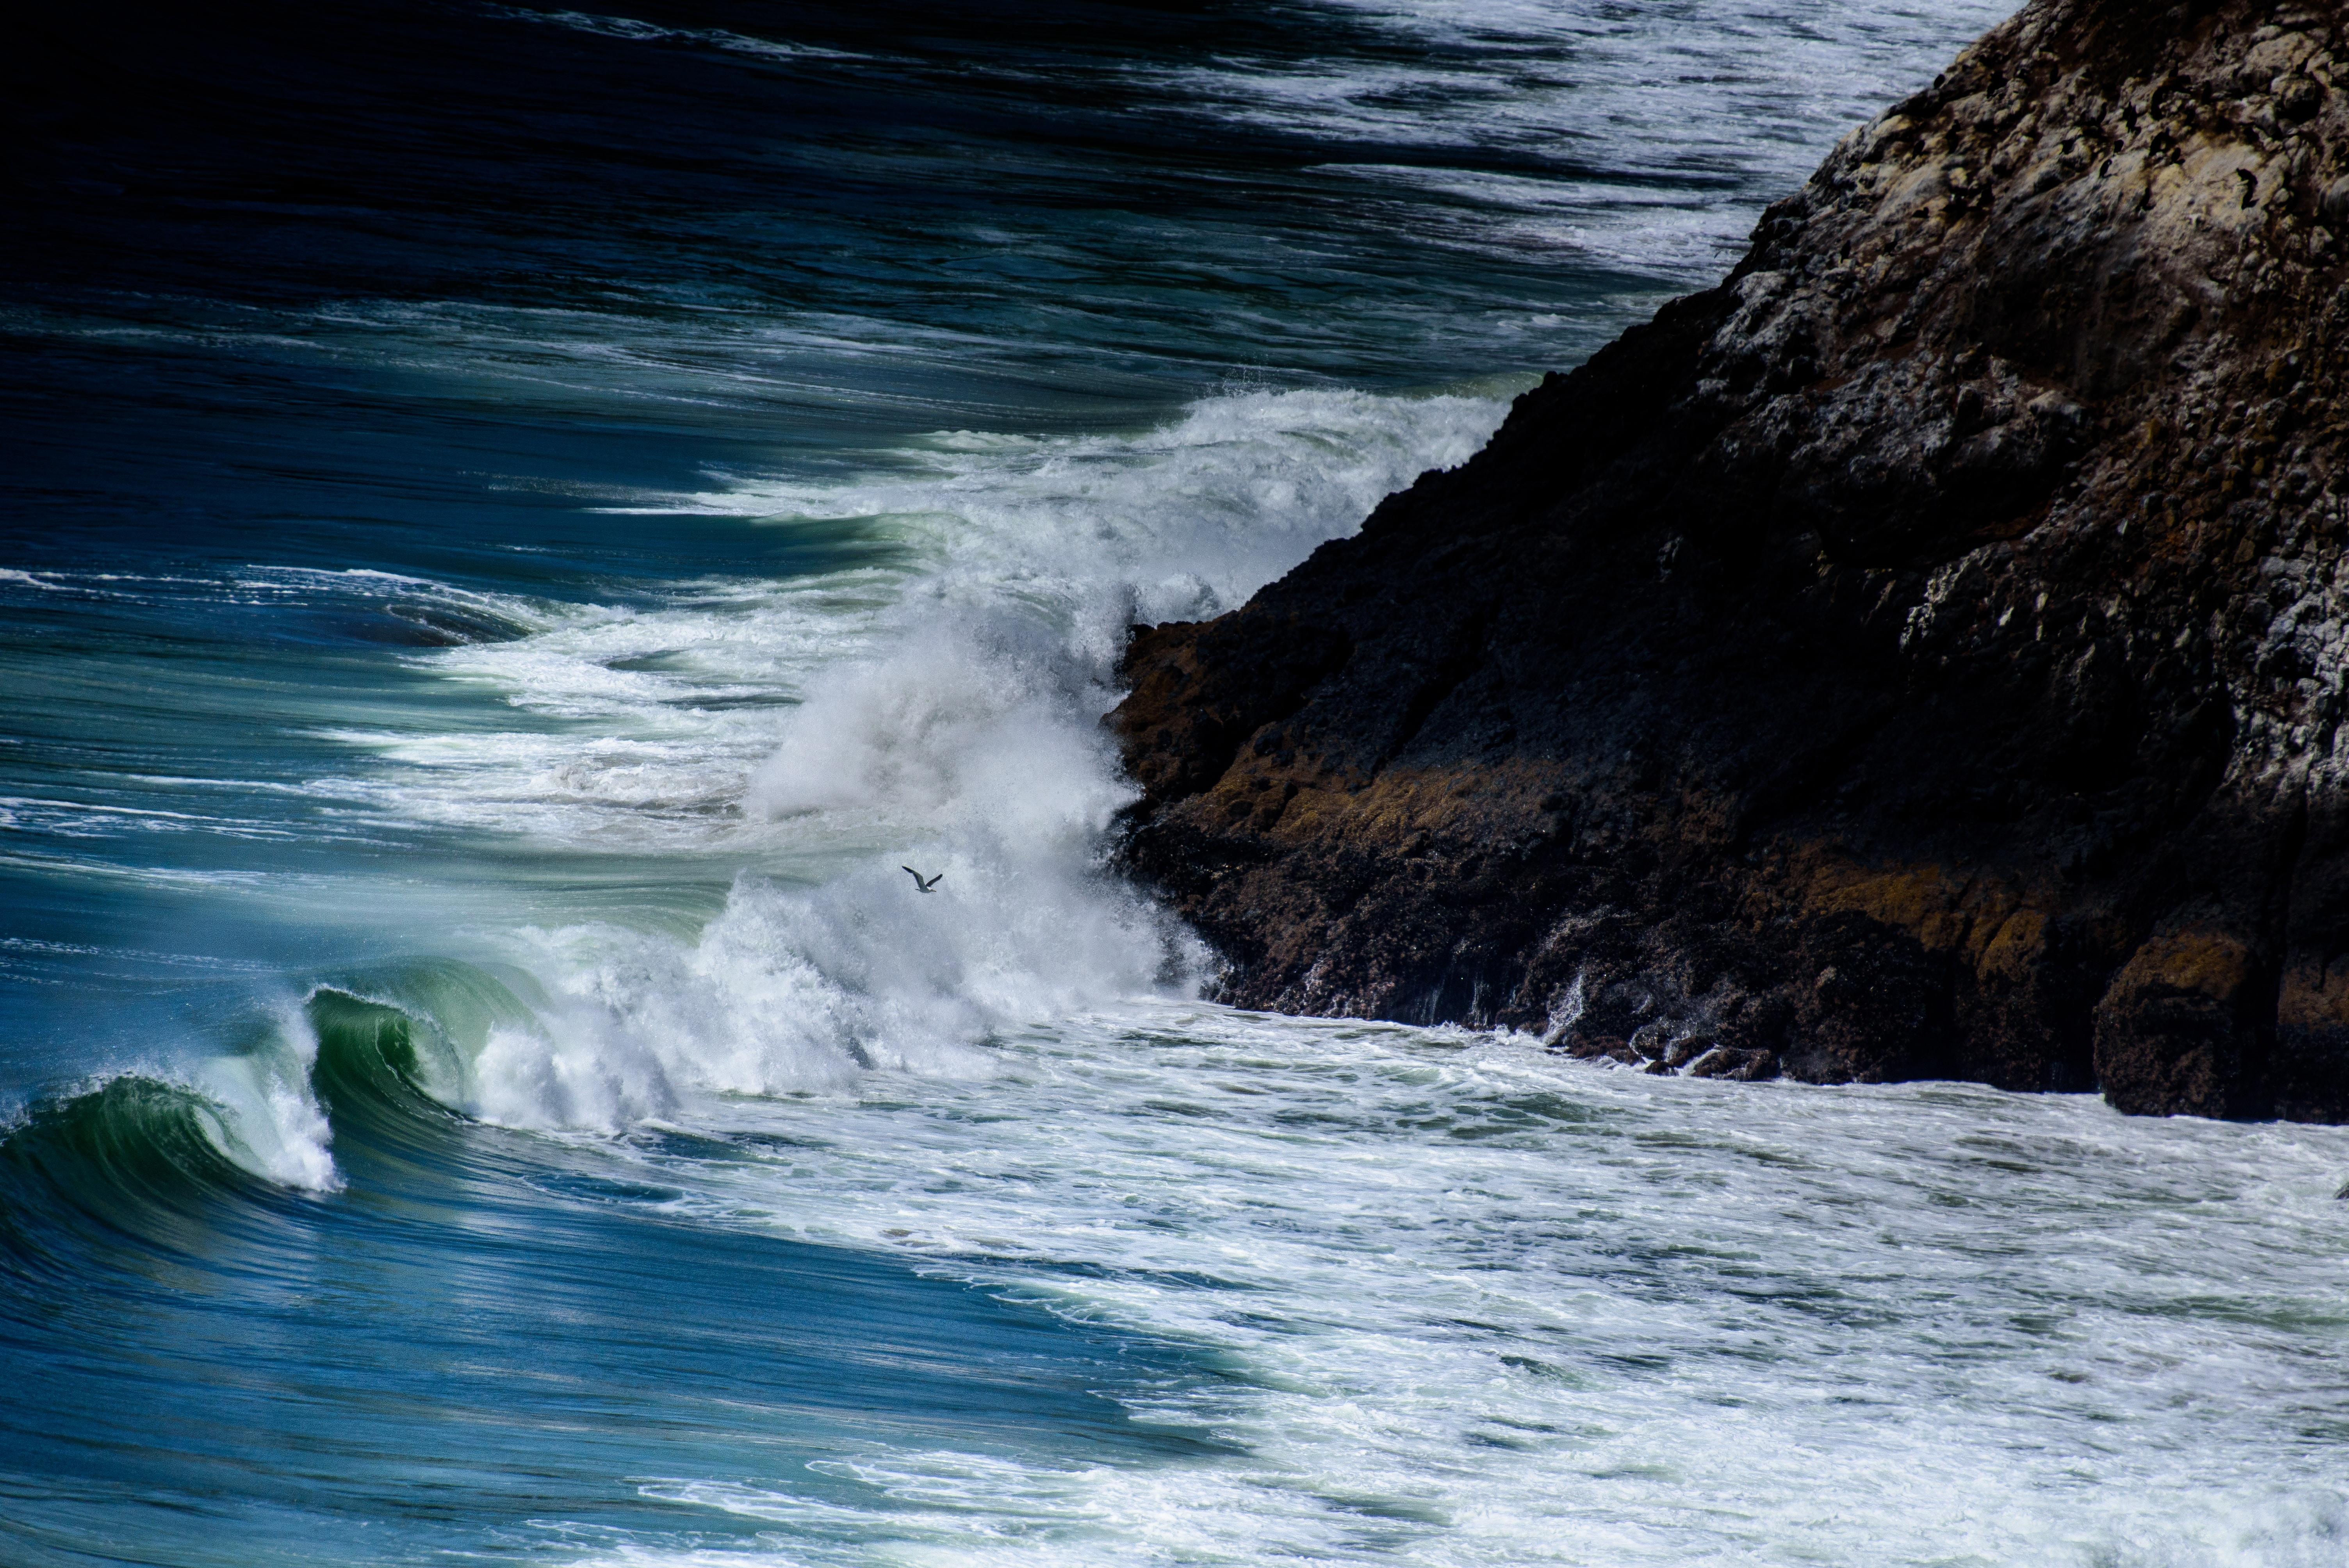 Waves crashing on the rocky coastline at Heceta Beach